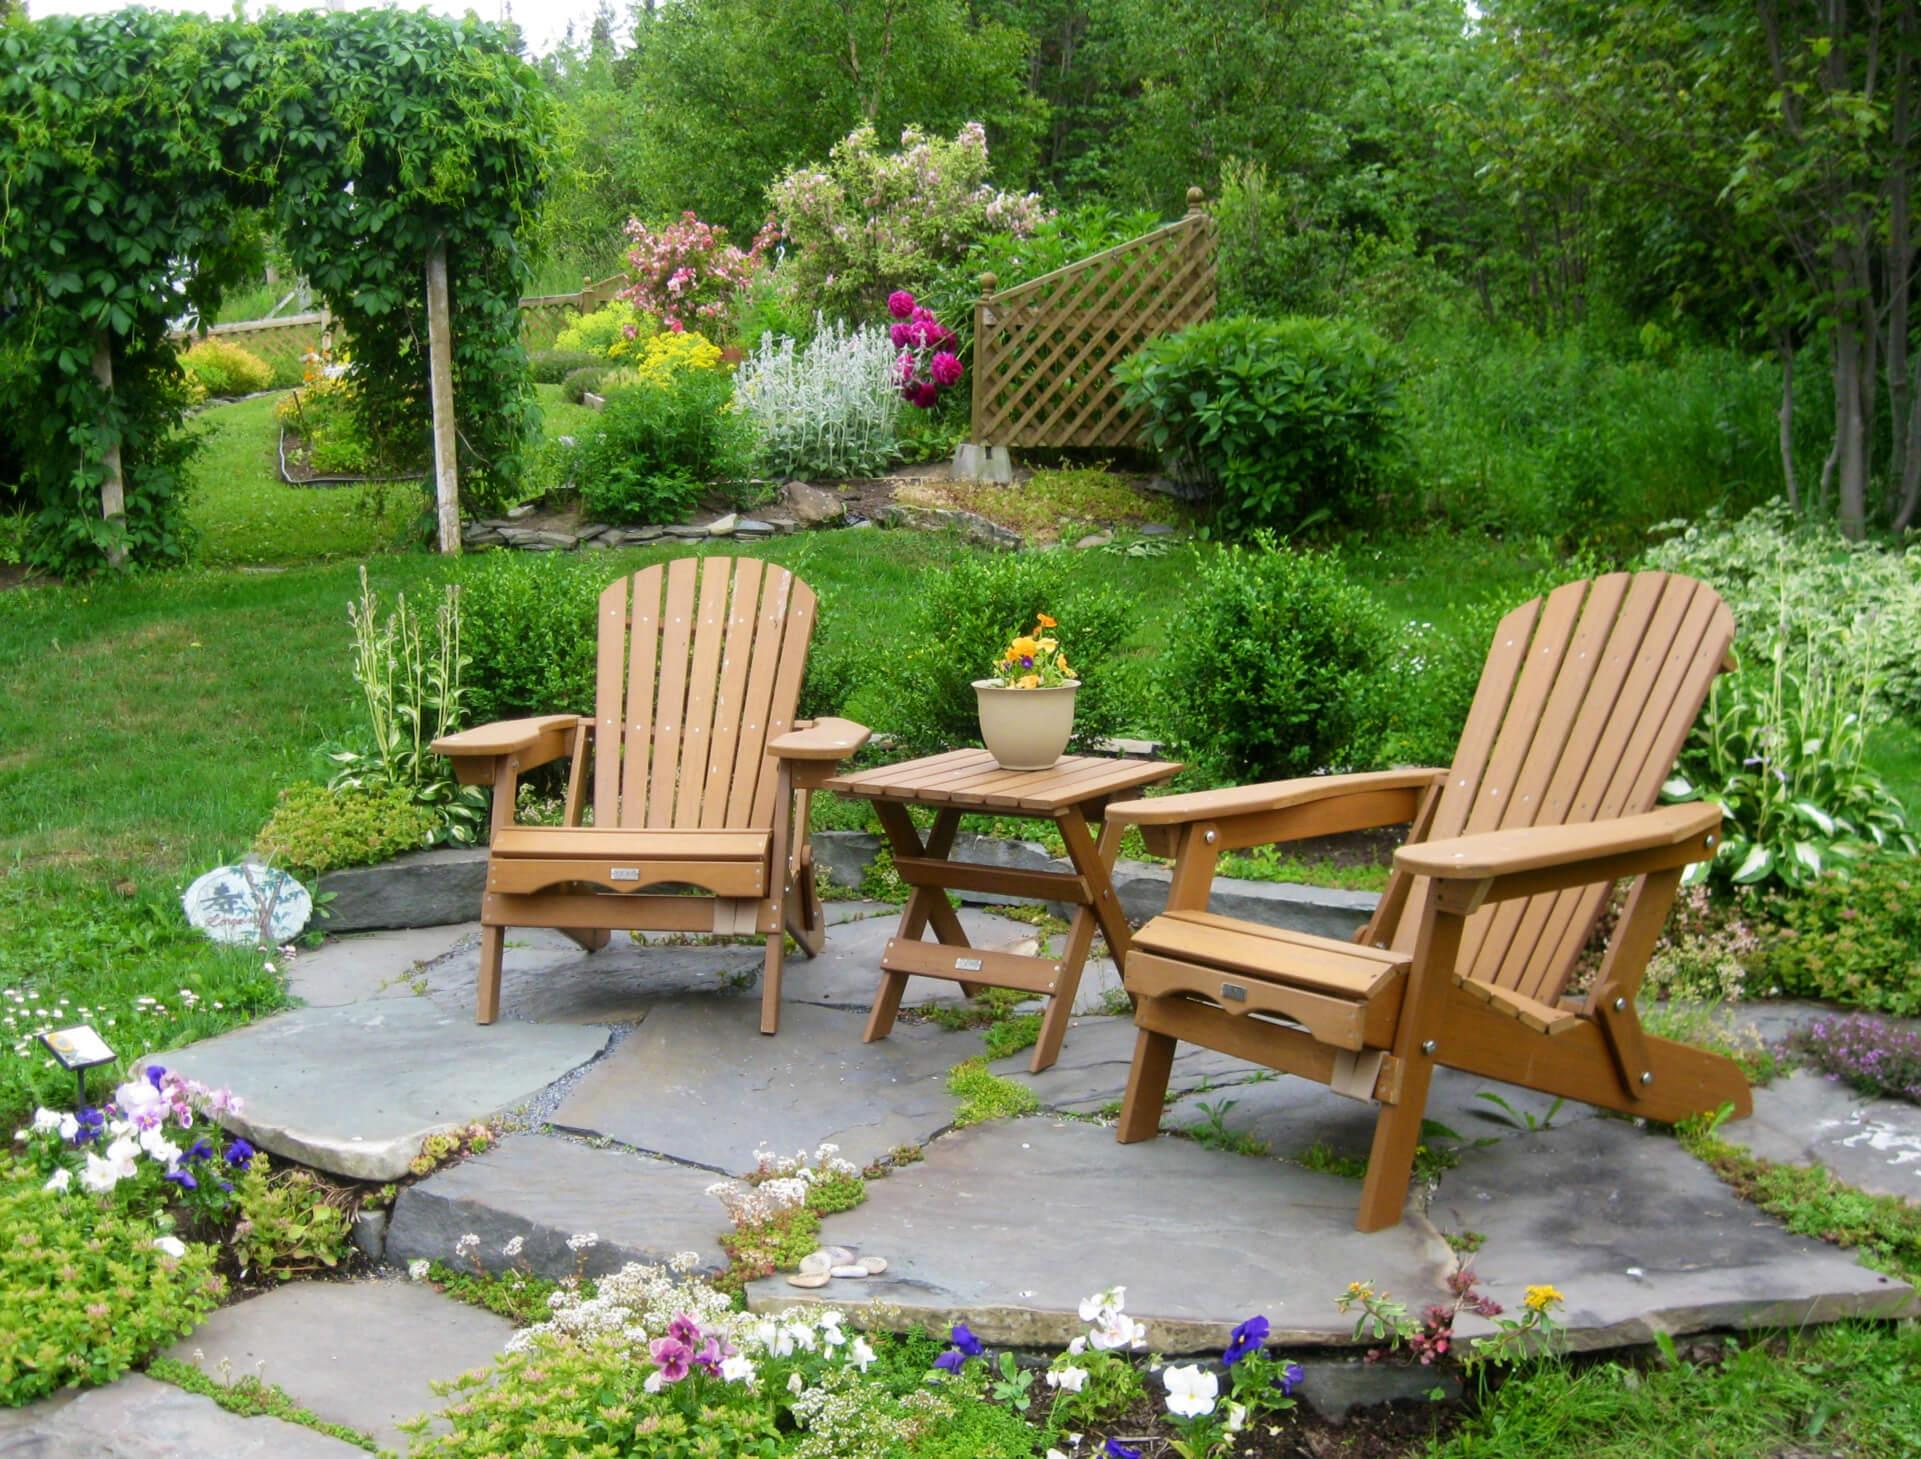 23 Magical Zen Gardens ideas for Enhance your Landscapes on Zen Garden Backyard Ideas id=89030